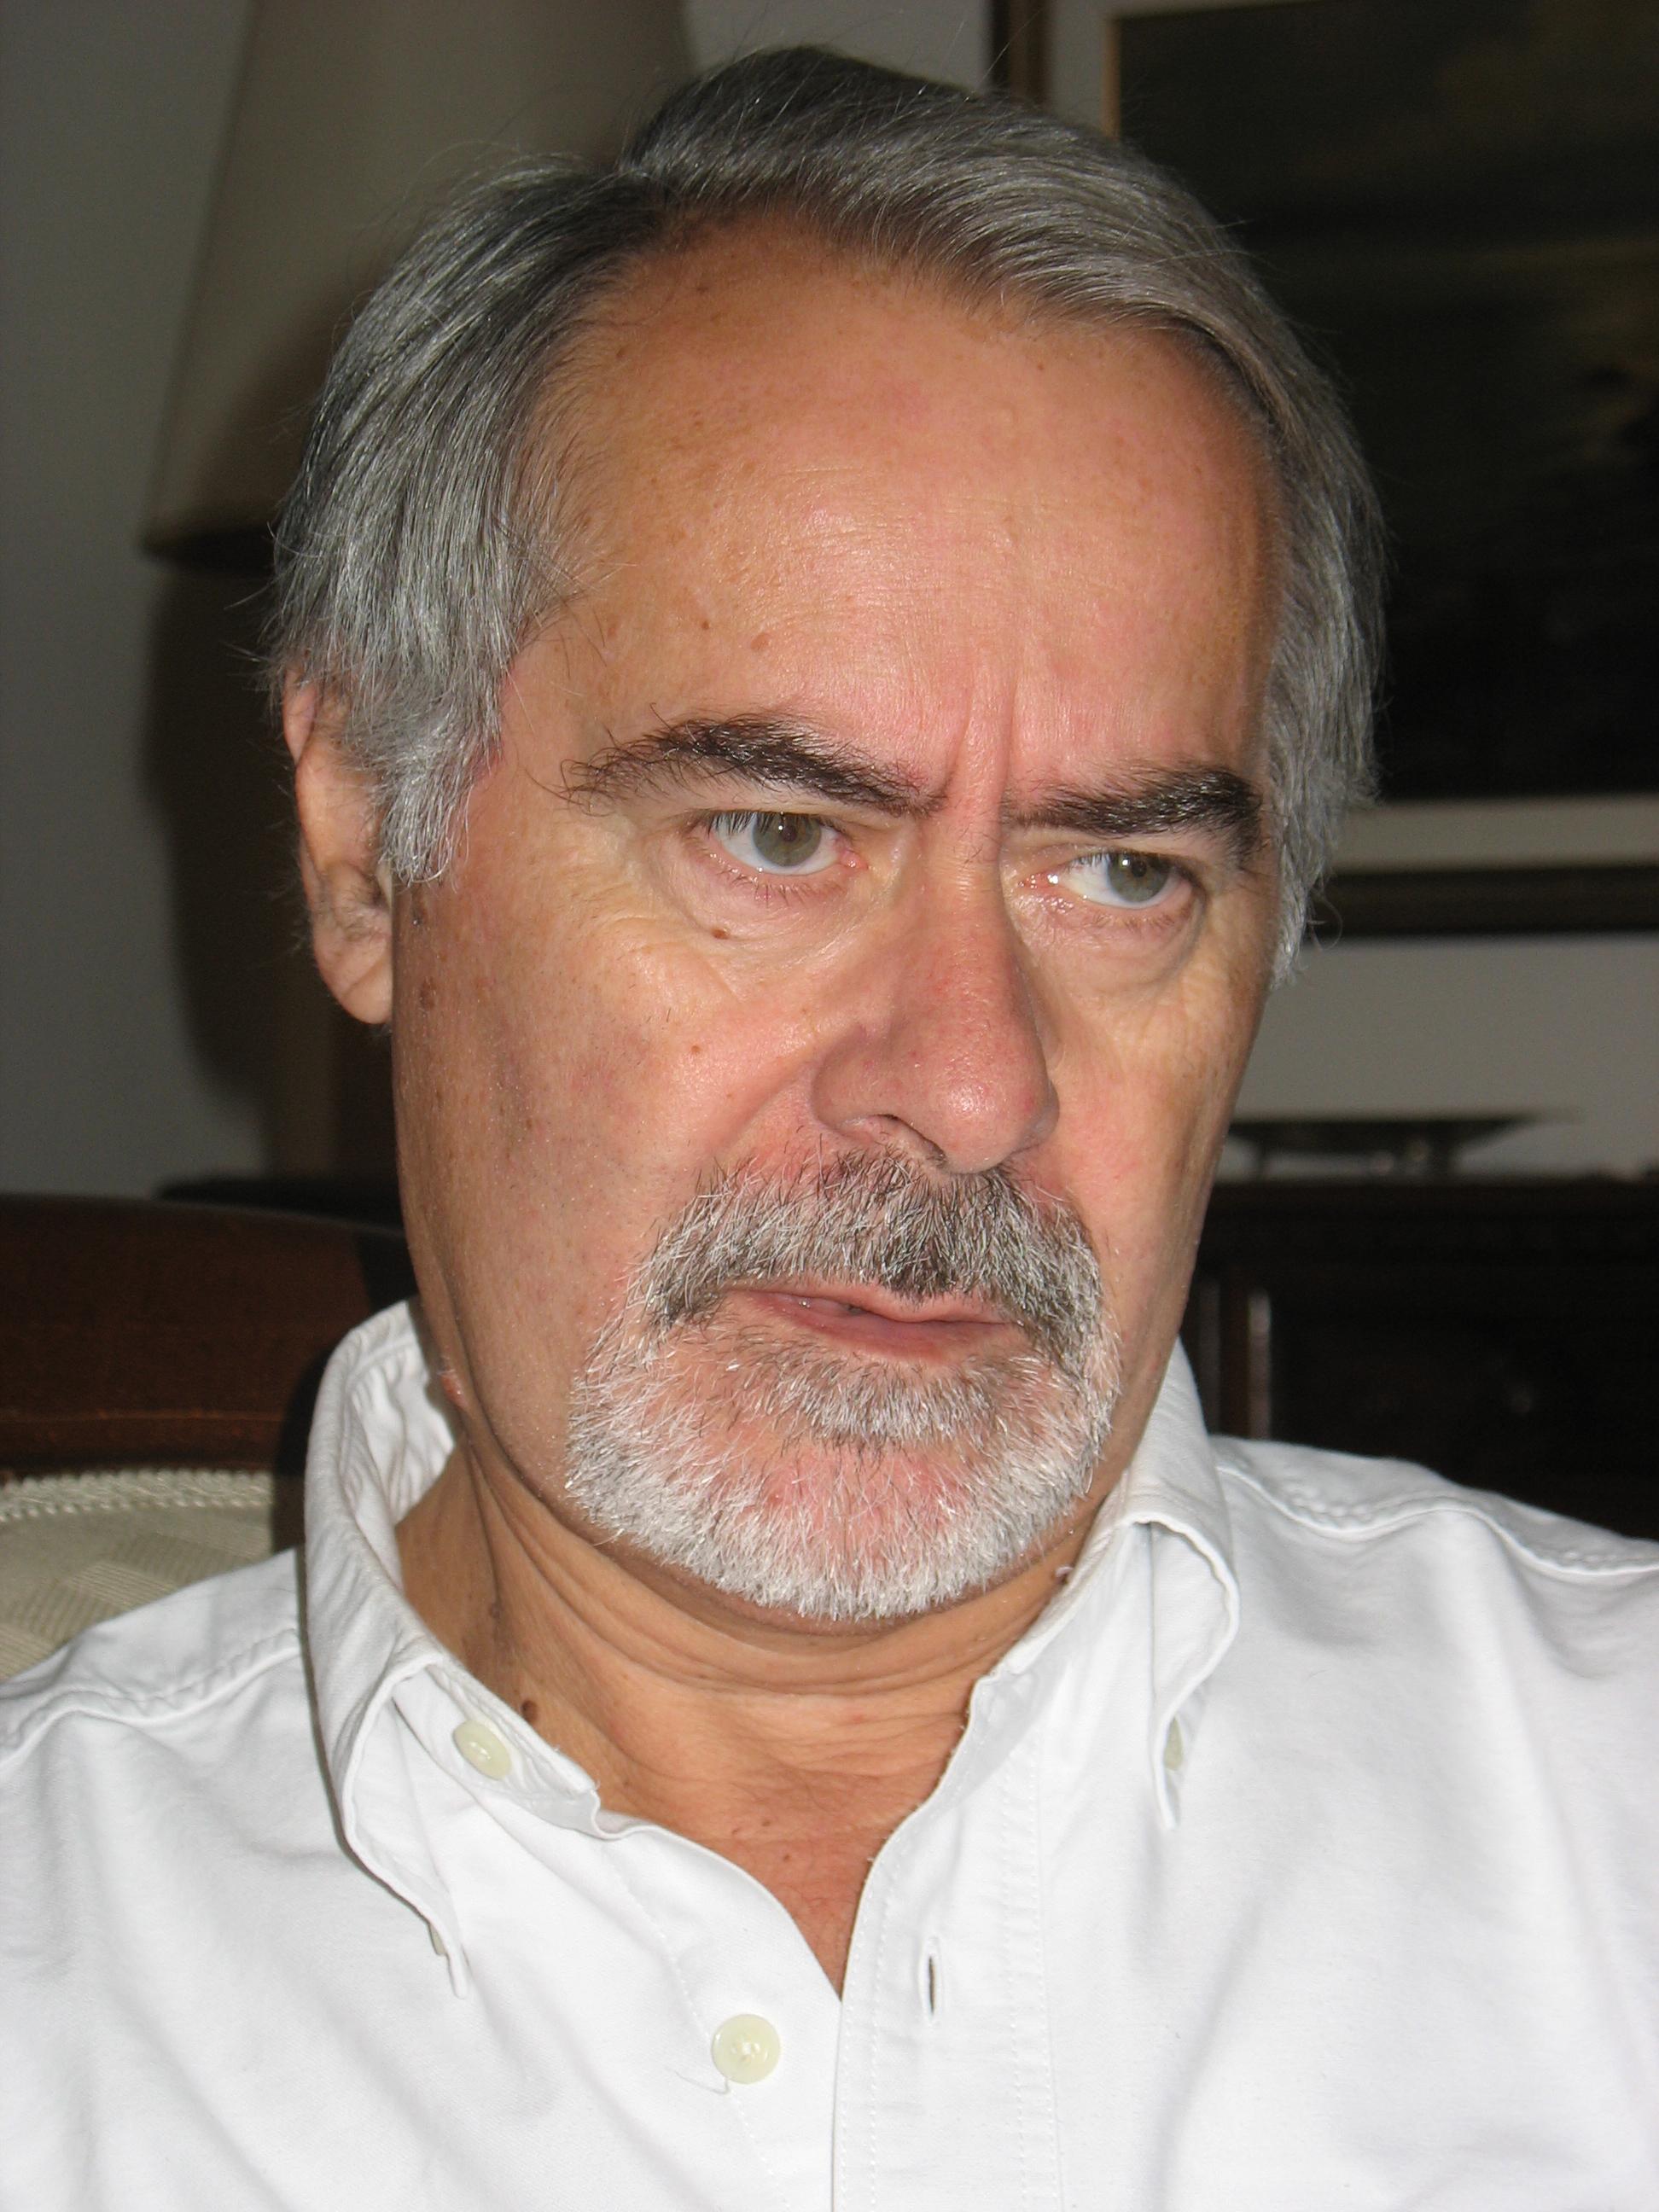 Prof. Armando Tripodi